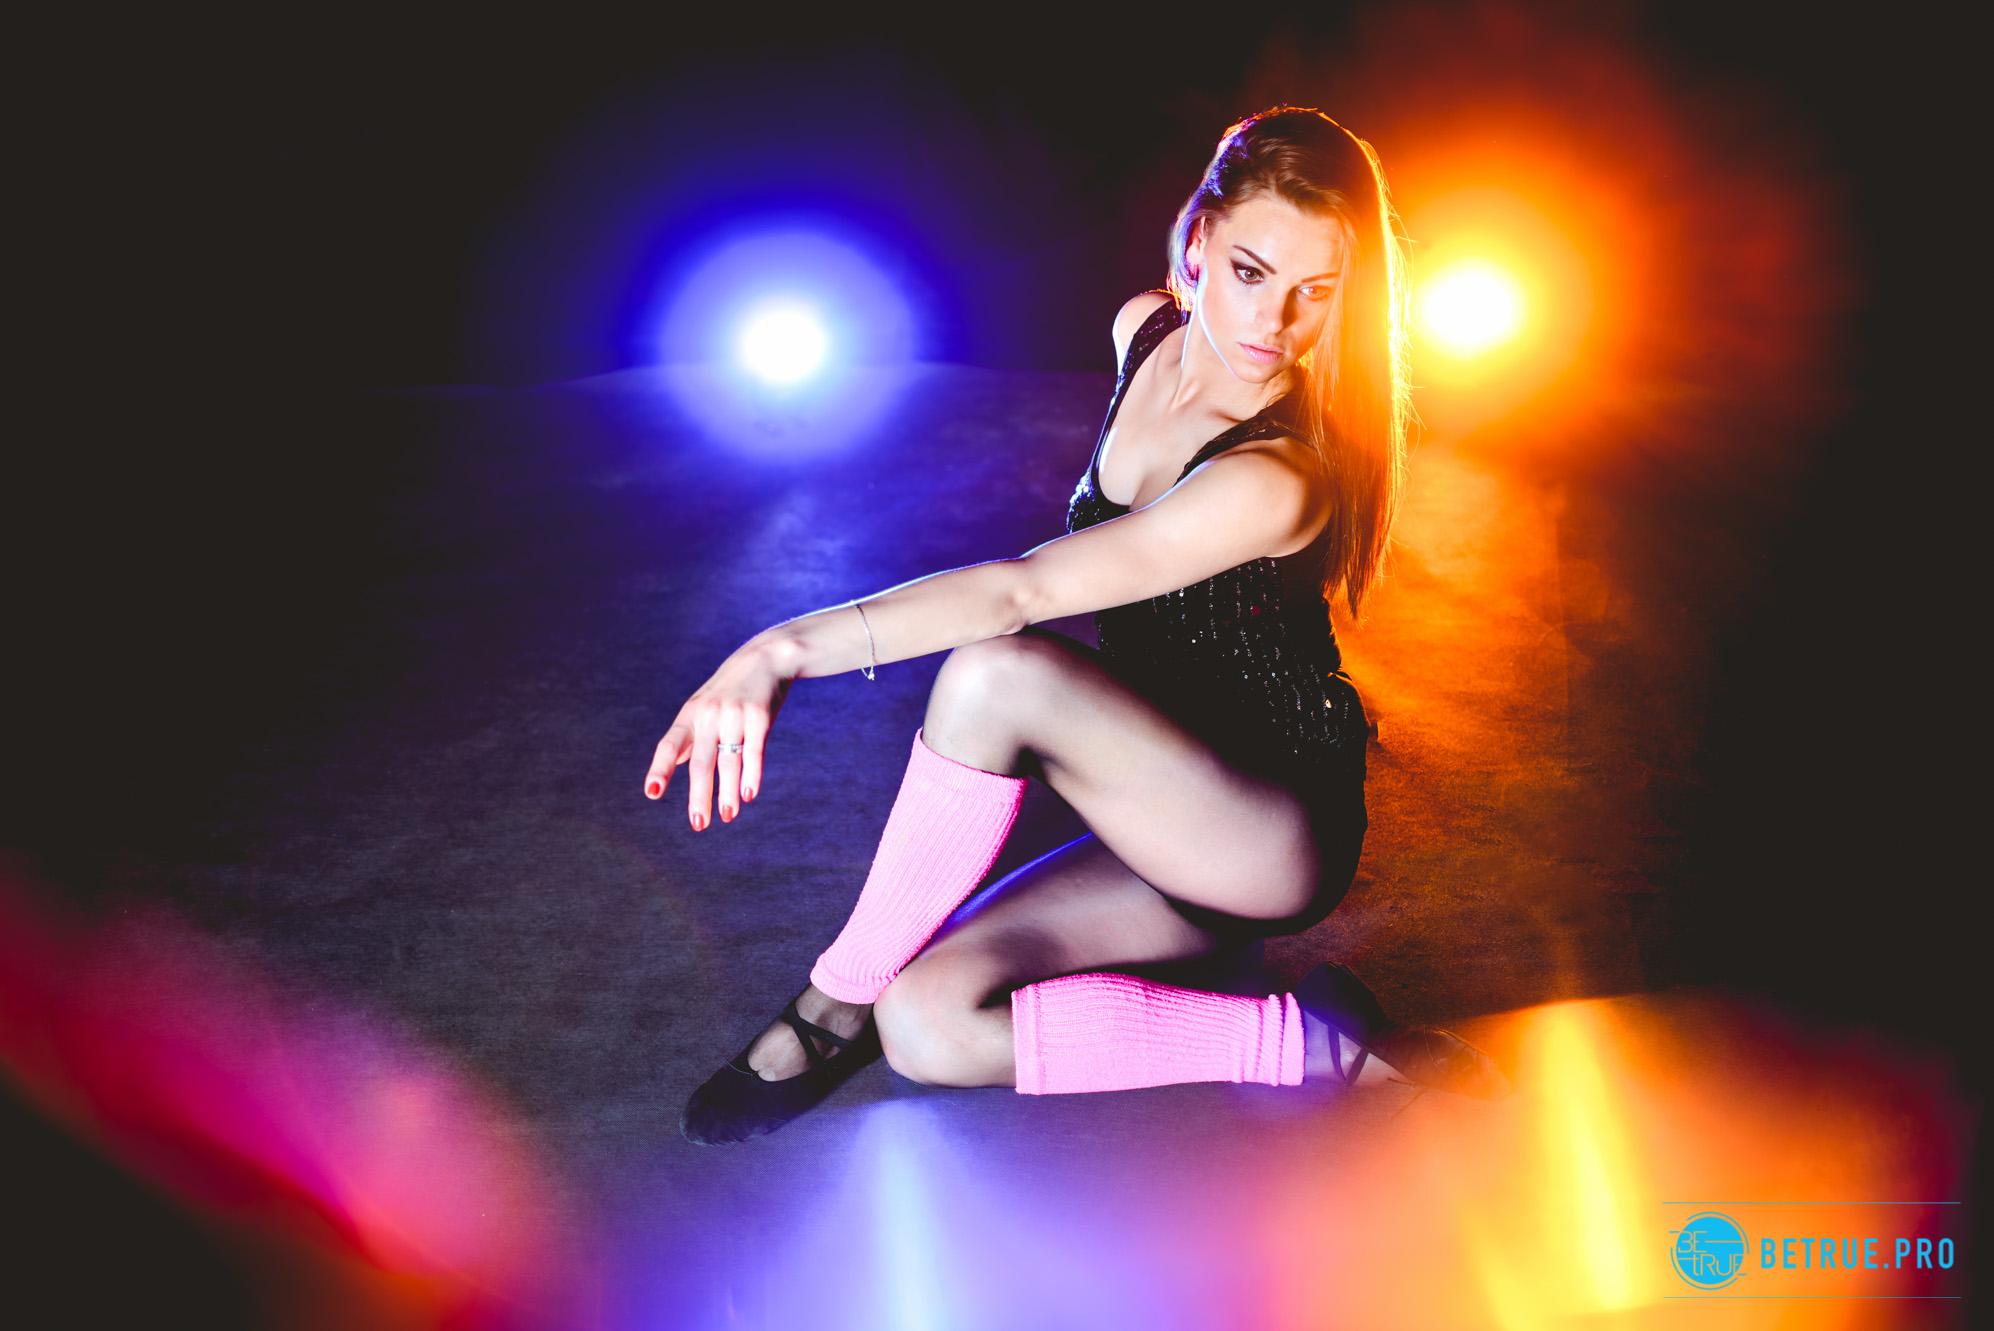 Kasia - Sexi dance